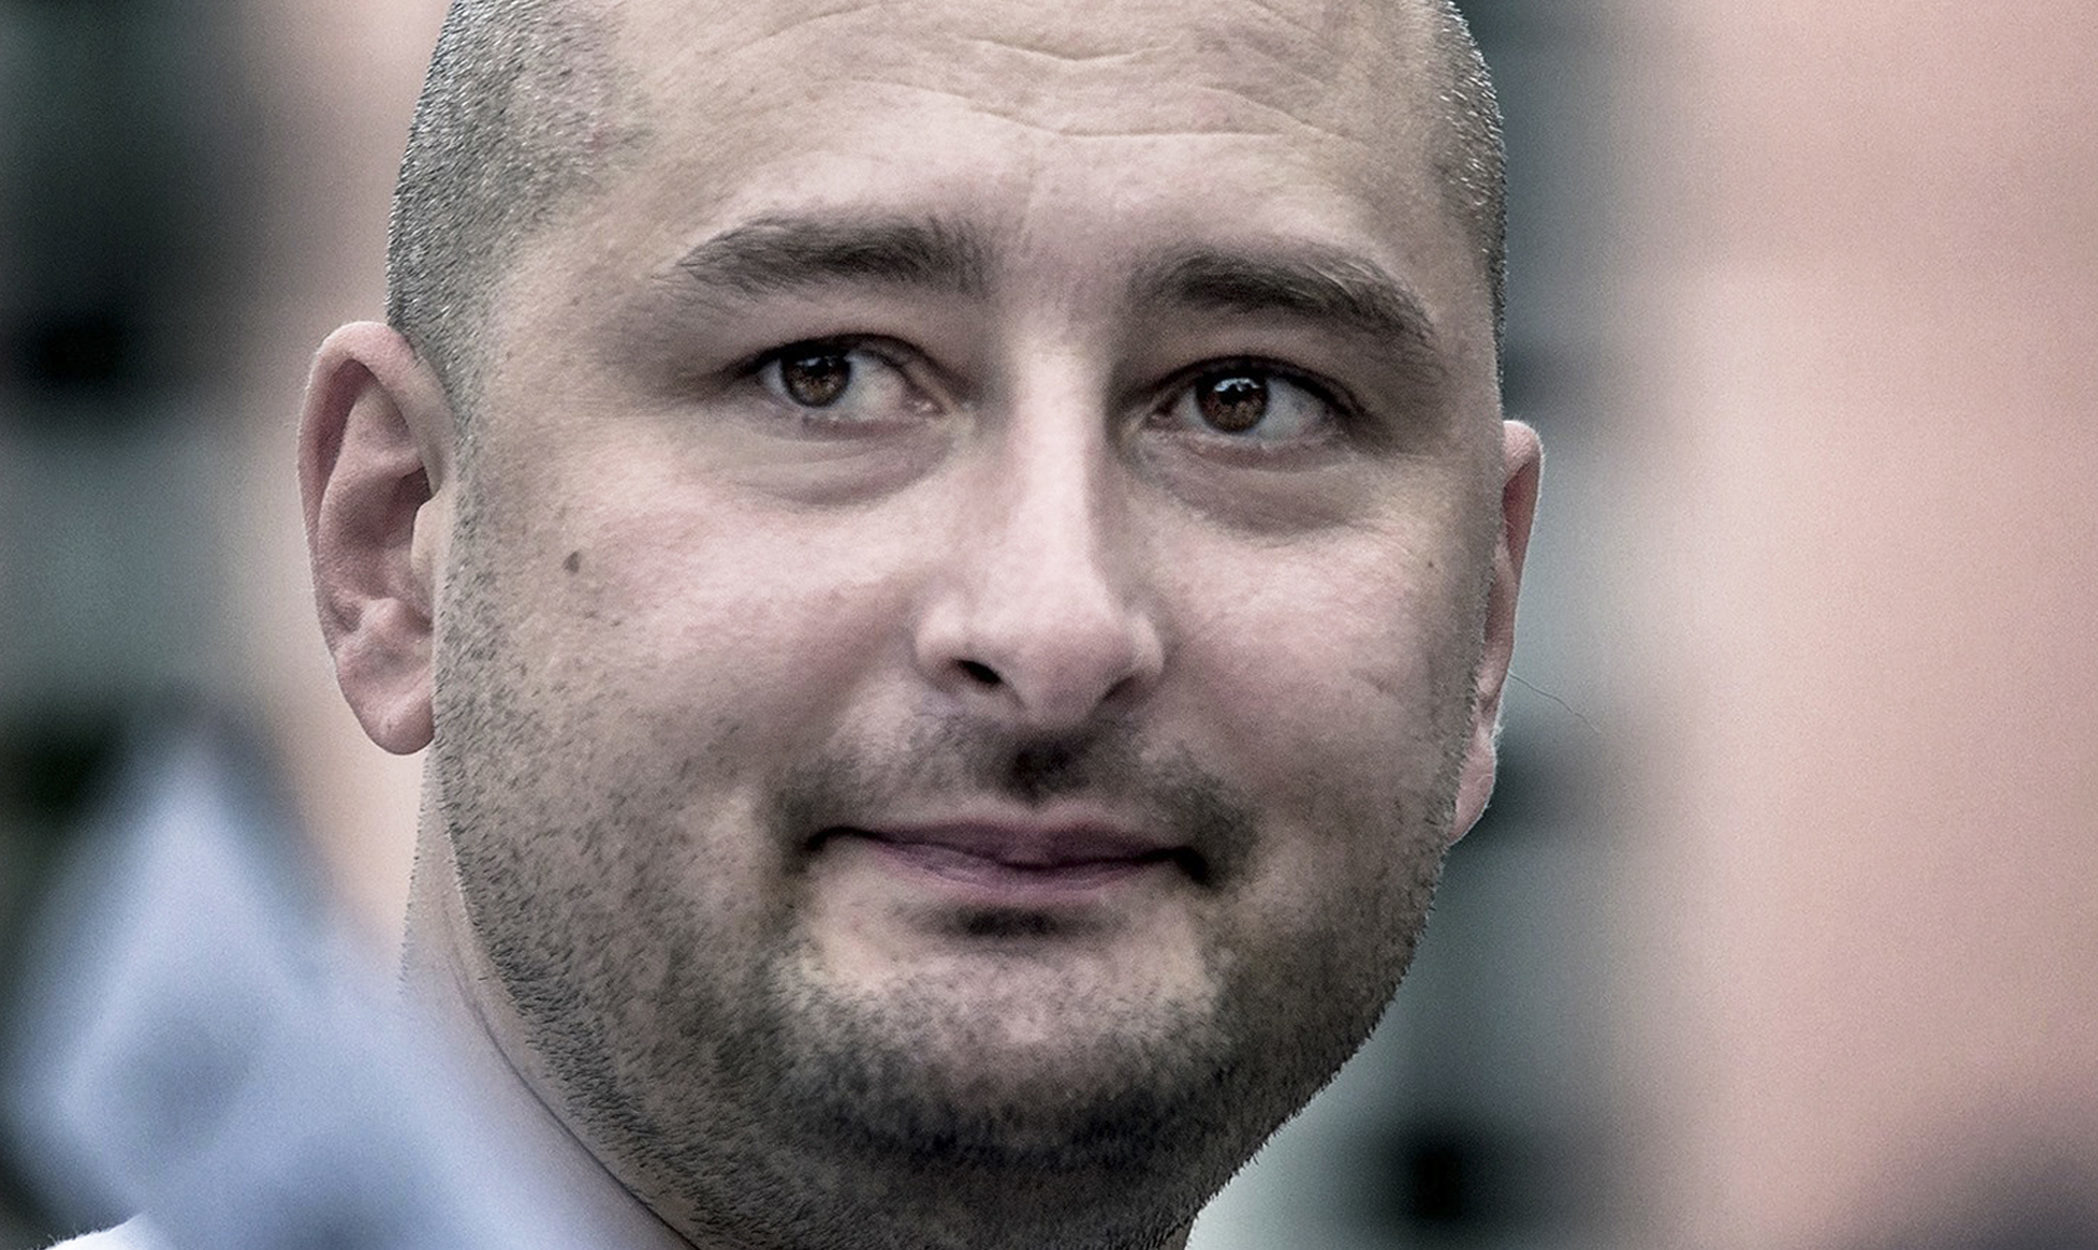 Arkady Babchenko (AP Photo/Alexander Baroshin)